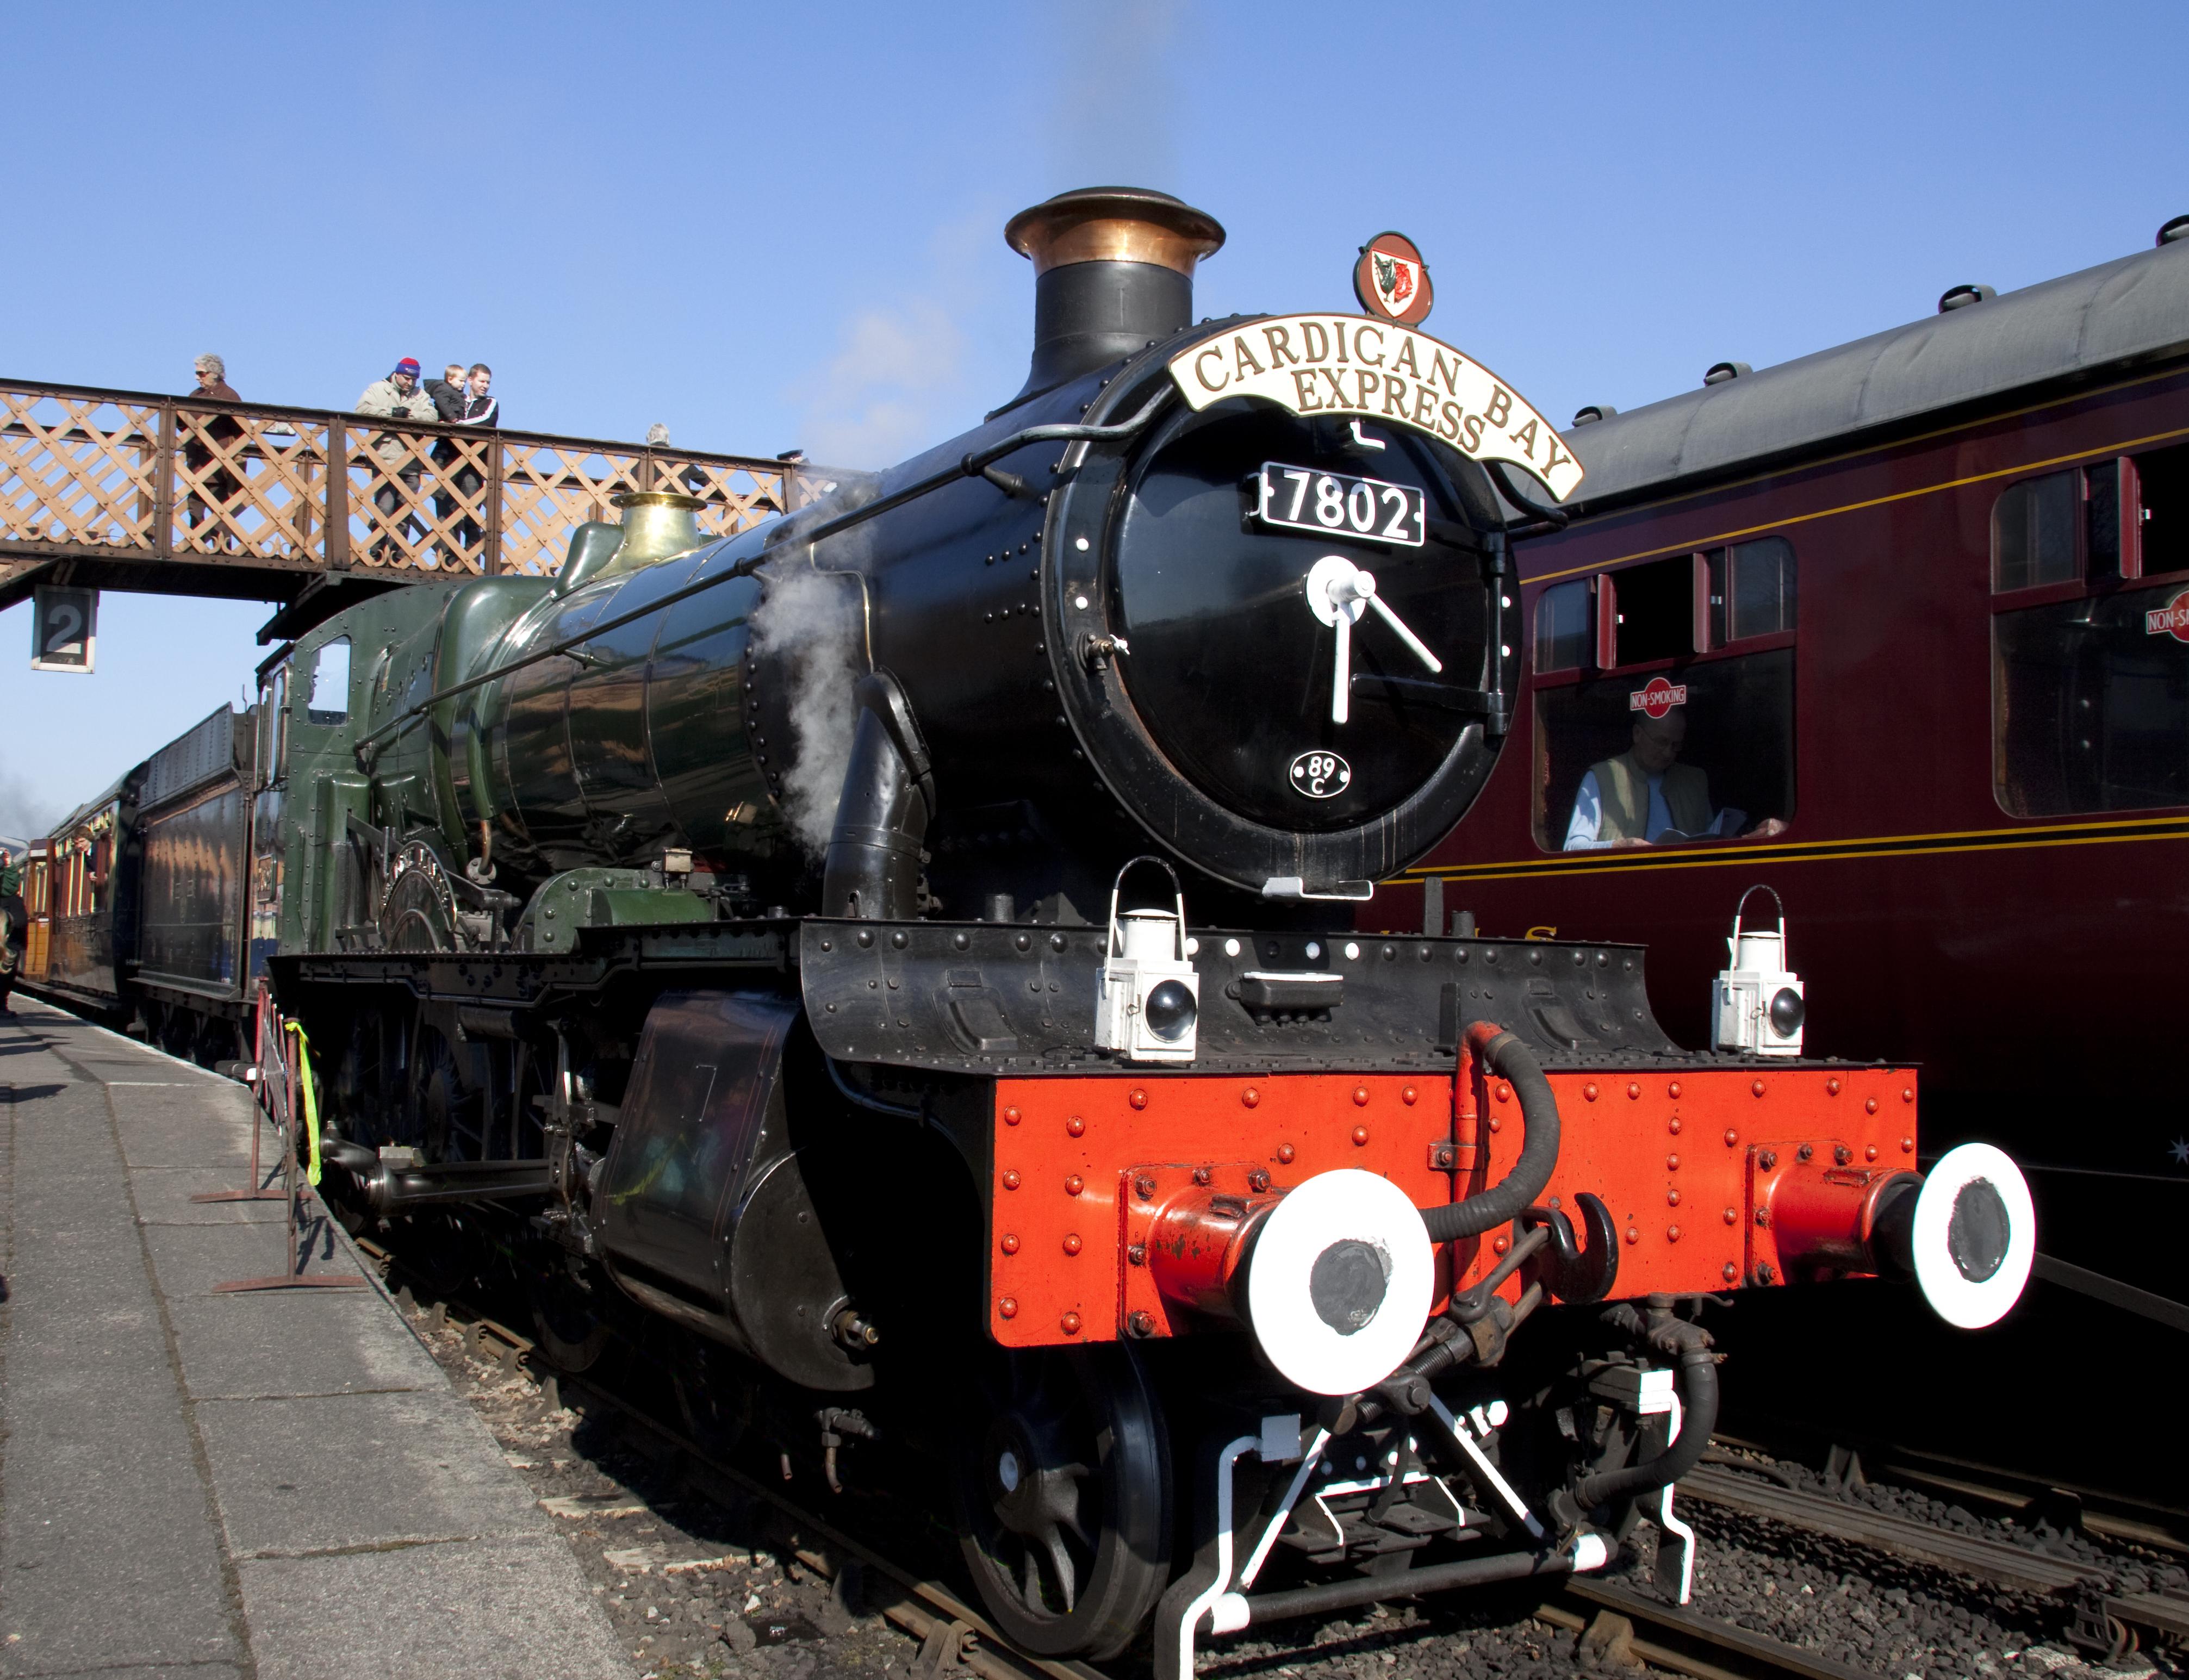 File:Bradley Manor 7802 Severn Valley Railway.jpg